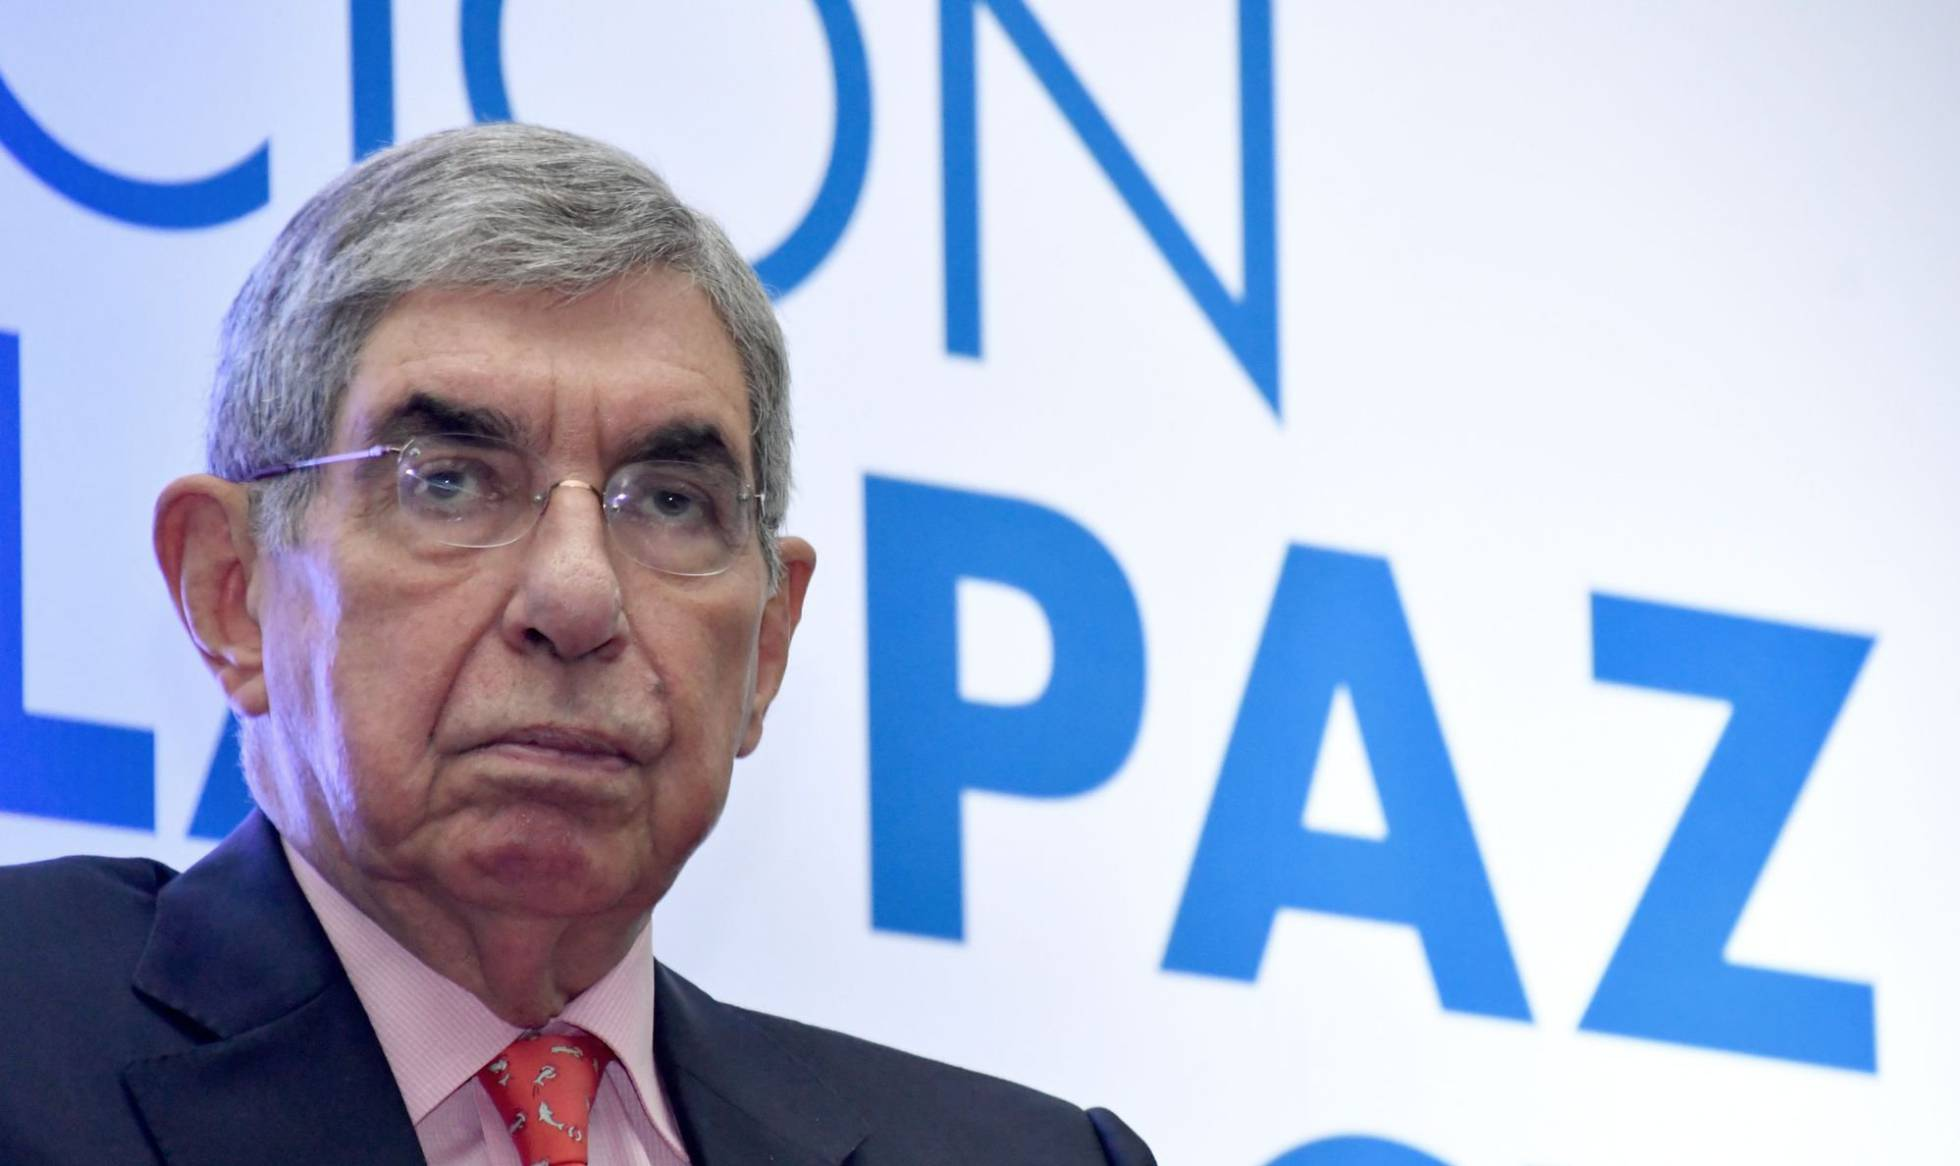 Una antigua reina de belleza se suma a las denuncias de abuso sexual en contra del expresidente Óscar Arias